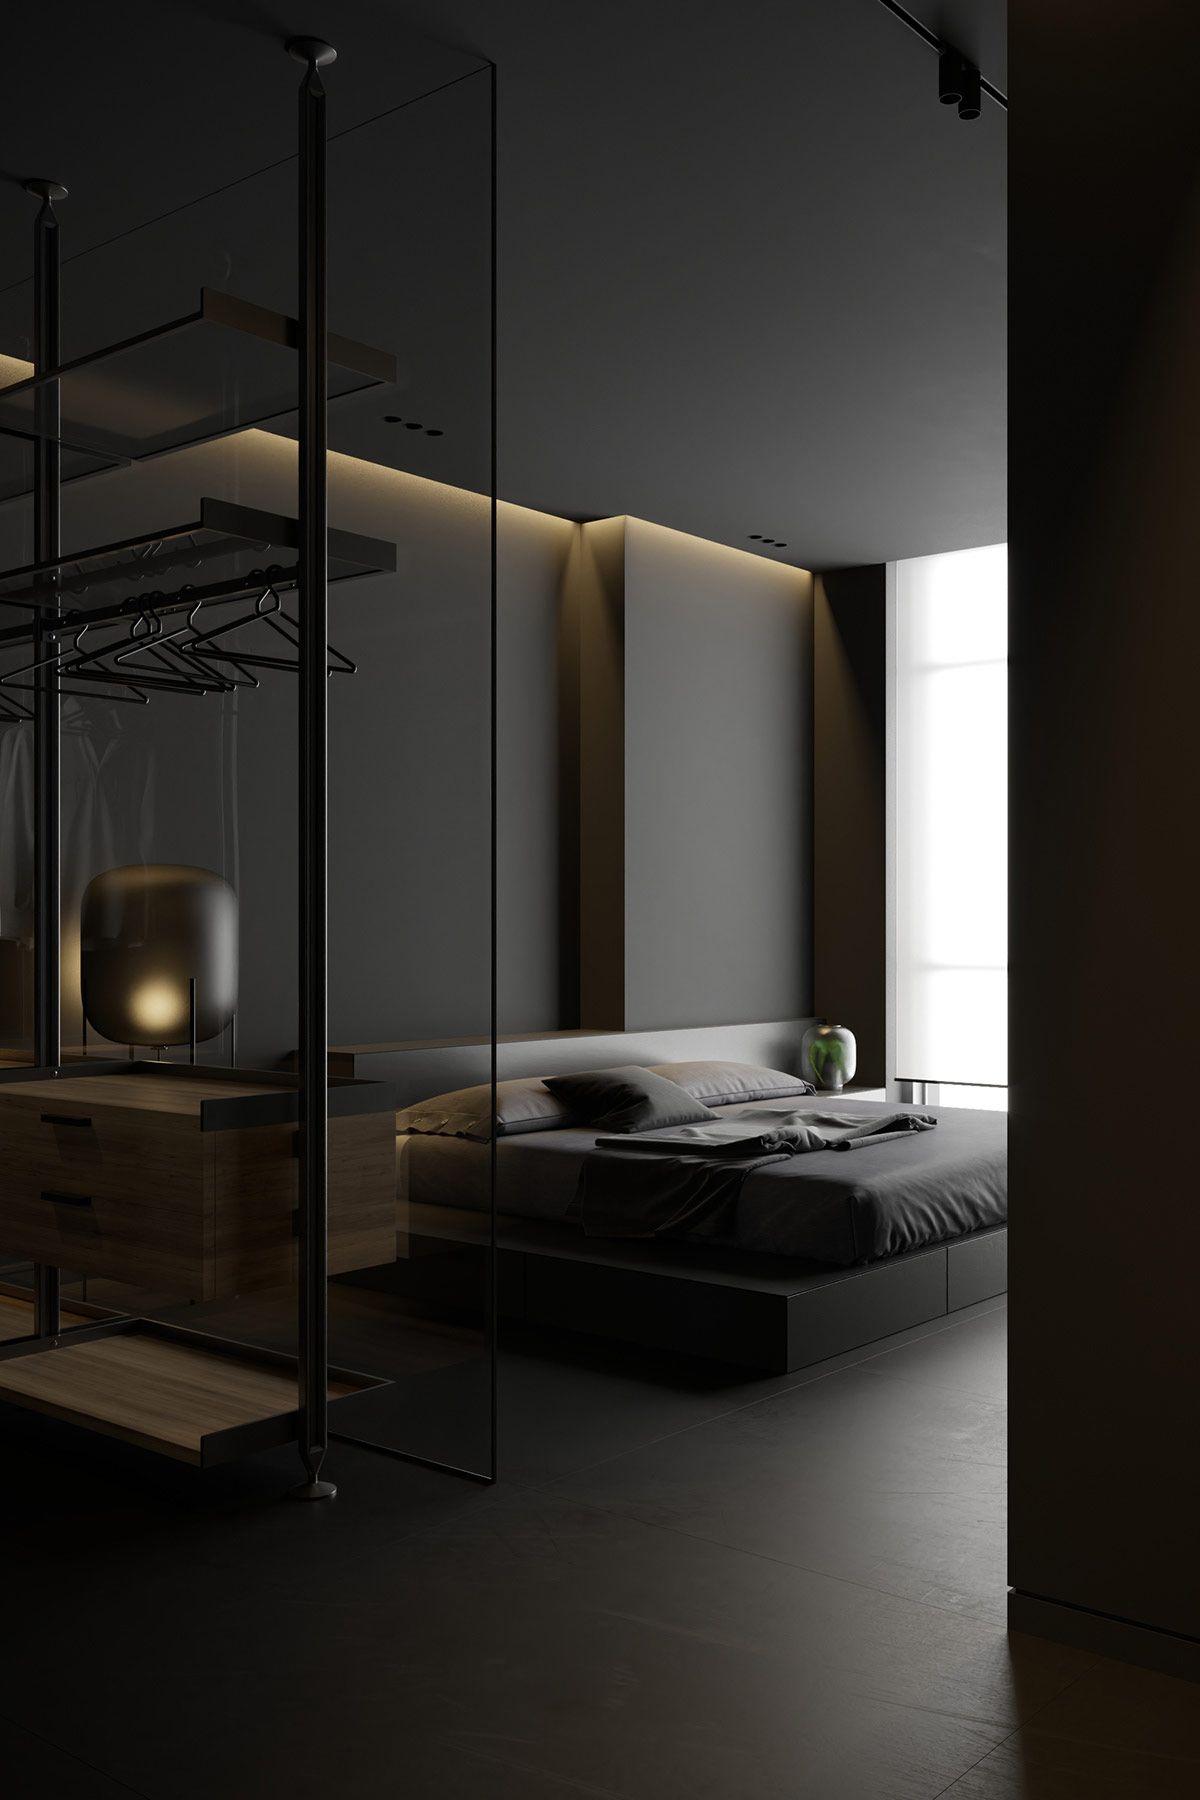 Dark Decor With Alluring Lighting In 2020 Dark Interior Design Black Interior Design Interior